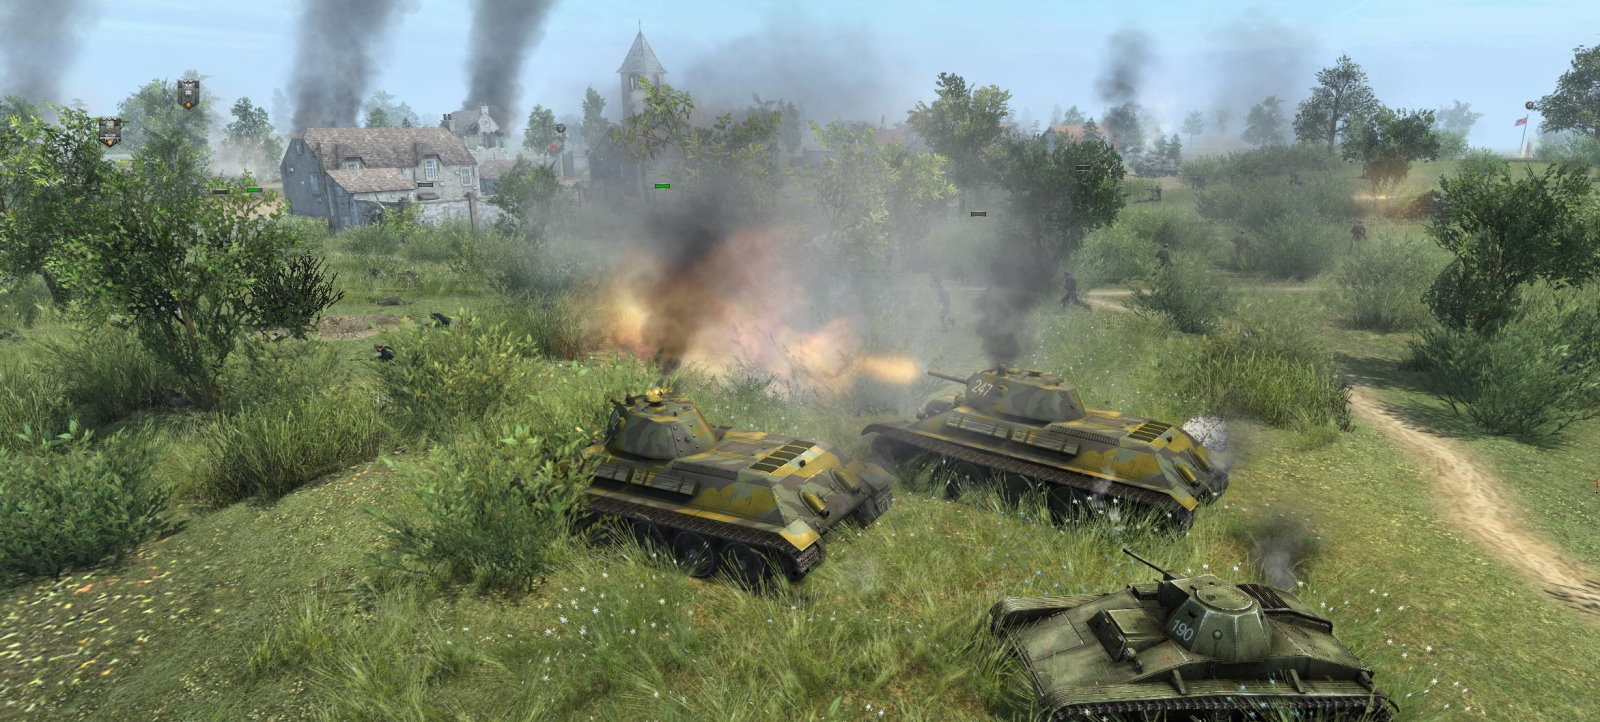 Super Robz Realism Effect for Assault Squad 2 (AS2 — 3.262.0) (v17.02.2021)